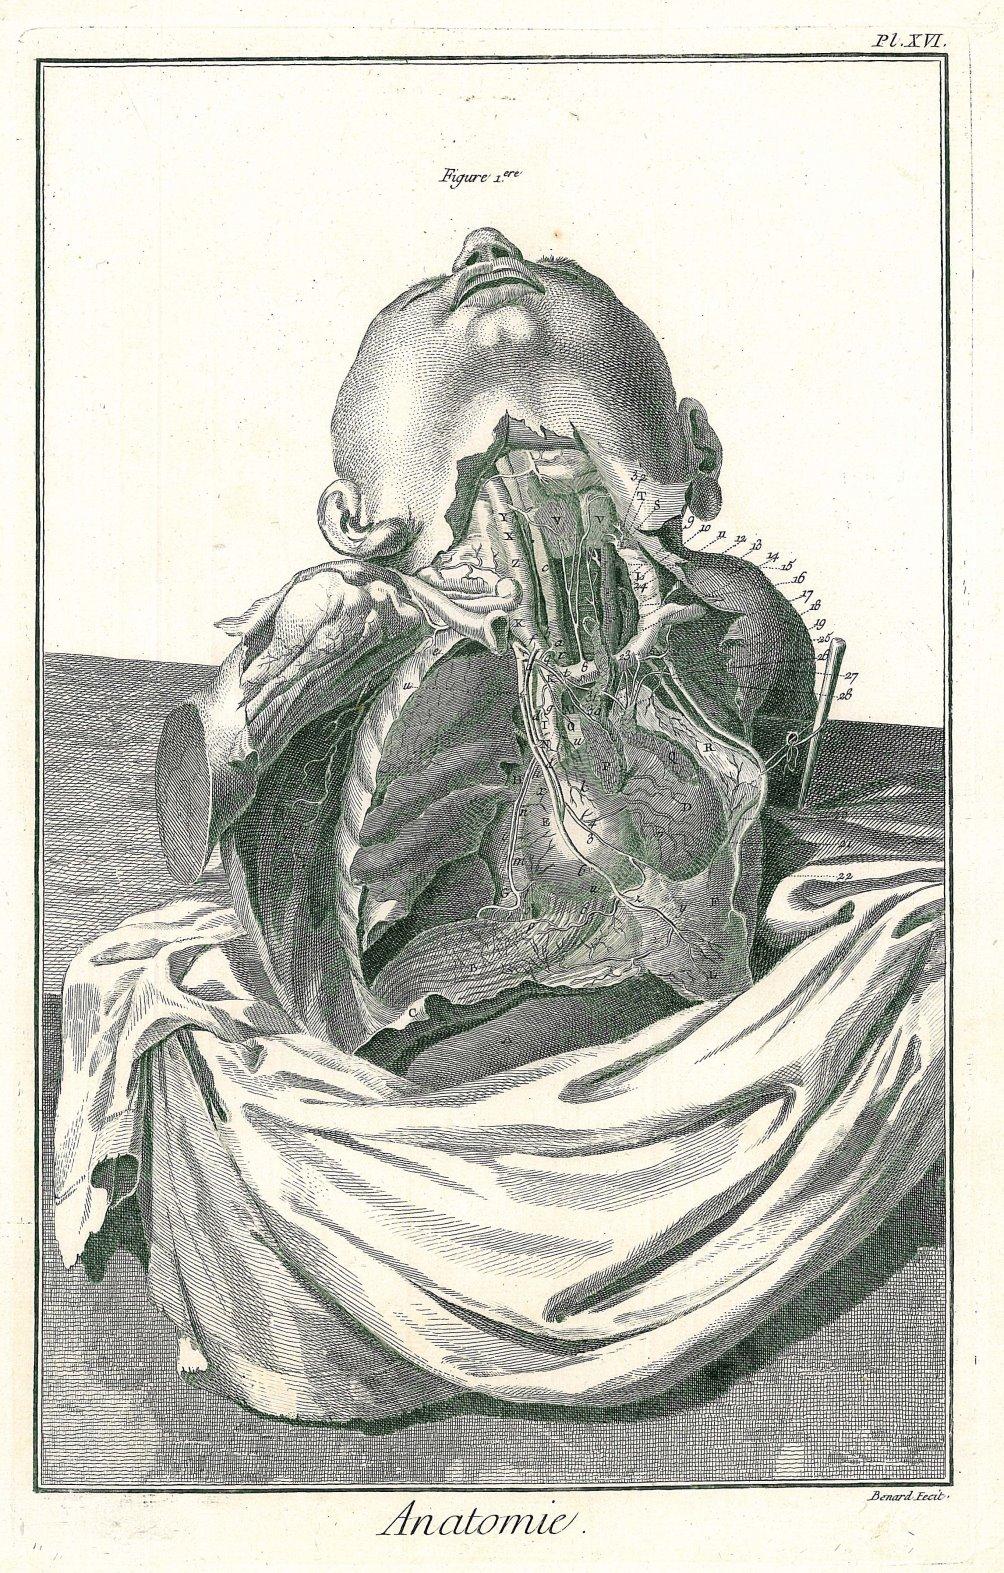 MEDIZIN. - Anatomie. - Rumpf.